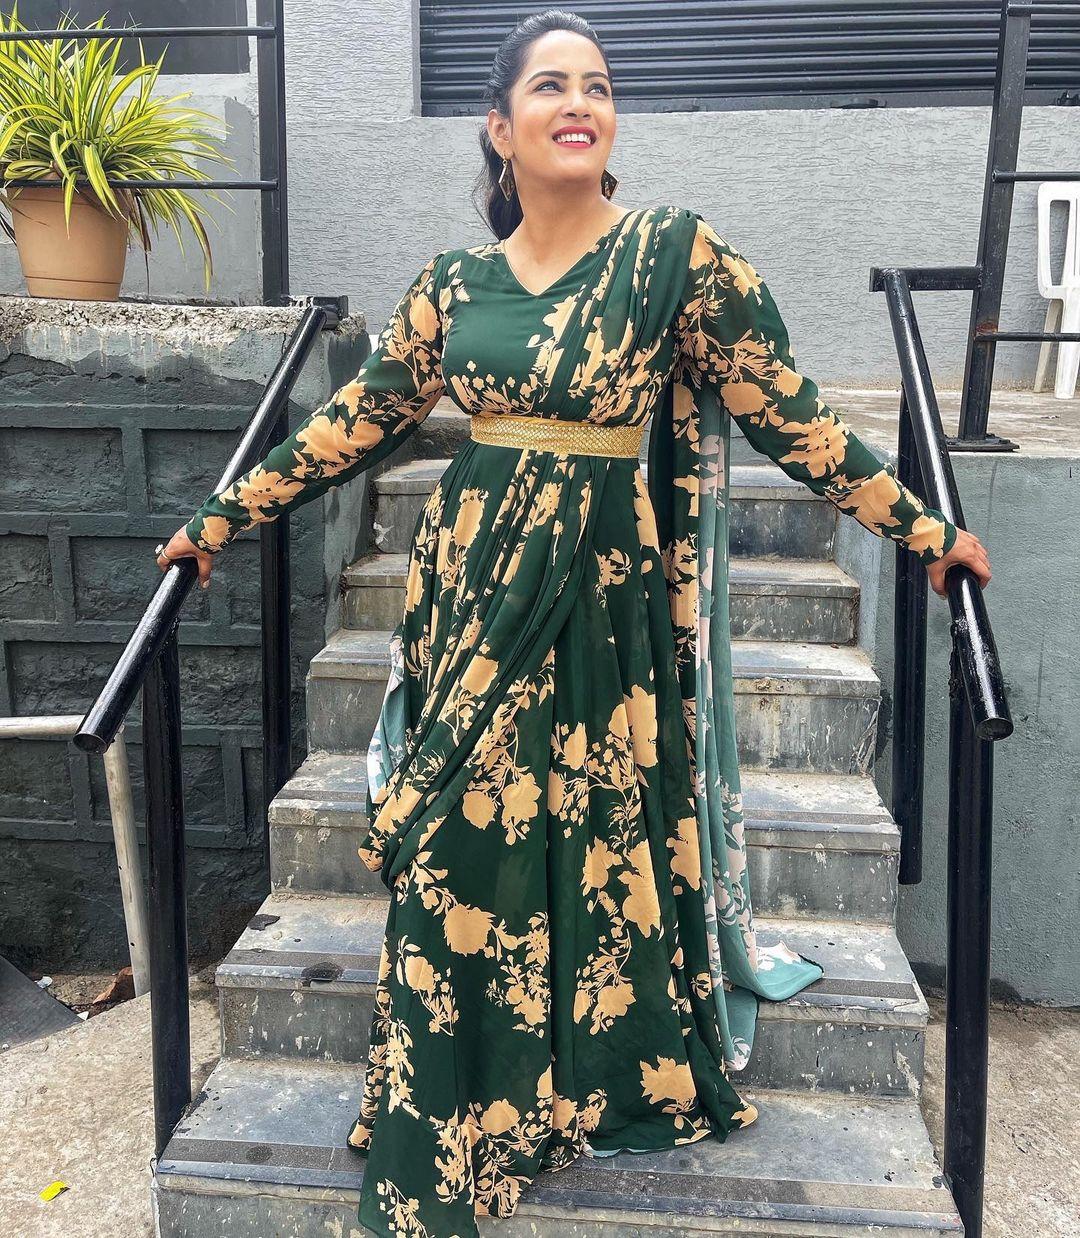 Beautiful actress Himaja in bottle green floor length floral long frock with waist belt. 2021-08-12